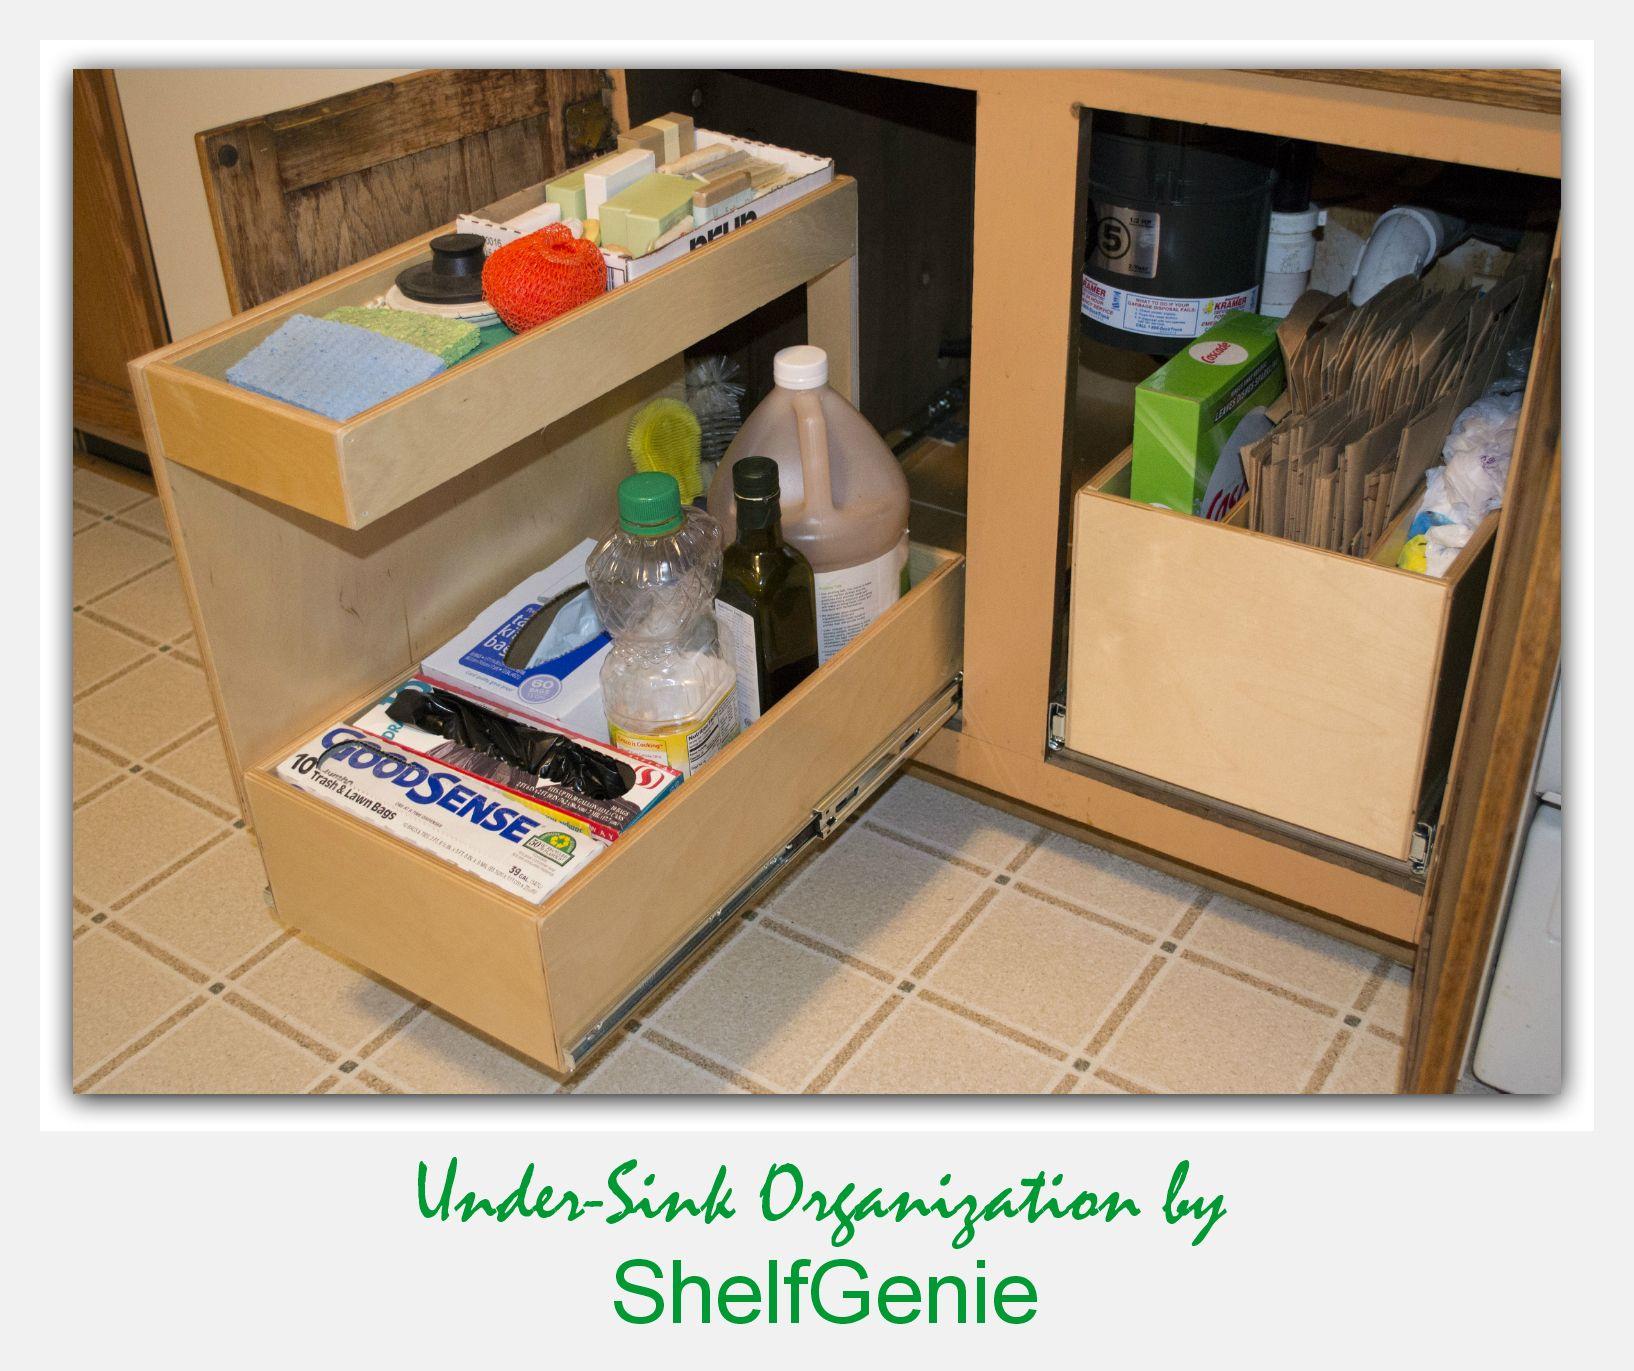 Kitchen Shelves Shelfgenie Of Chicago Kitchen Shelves Organization Kitchen Shelves Kitchen Sink Organization